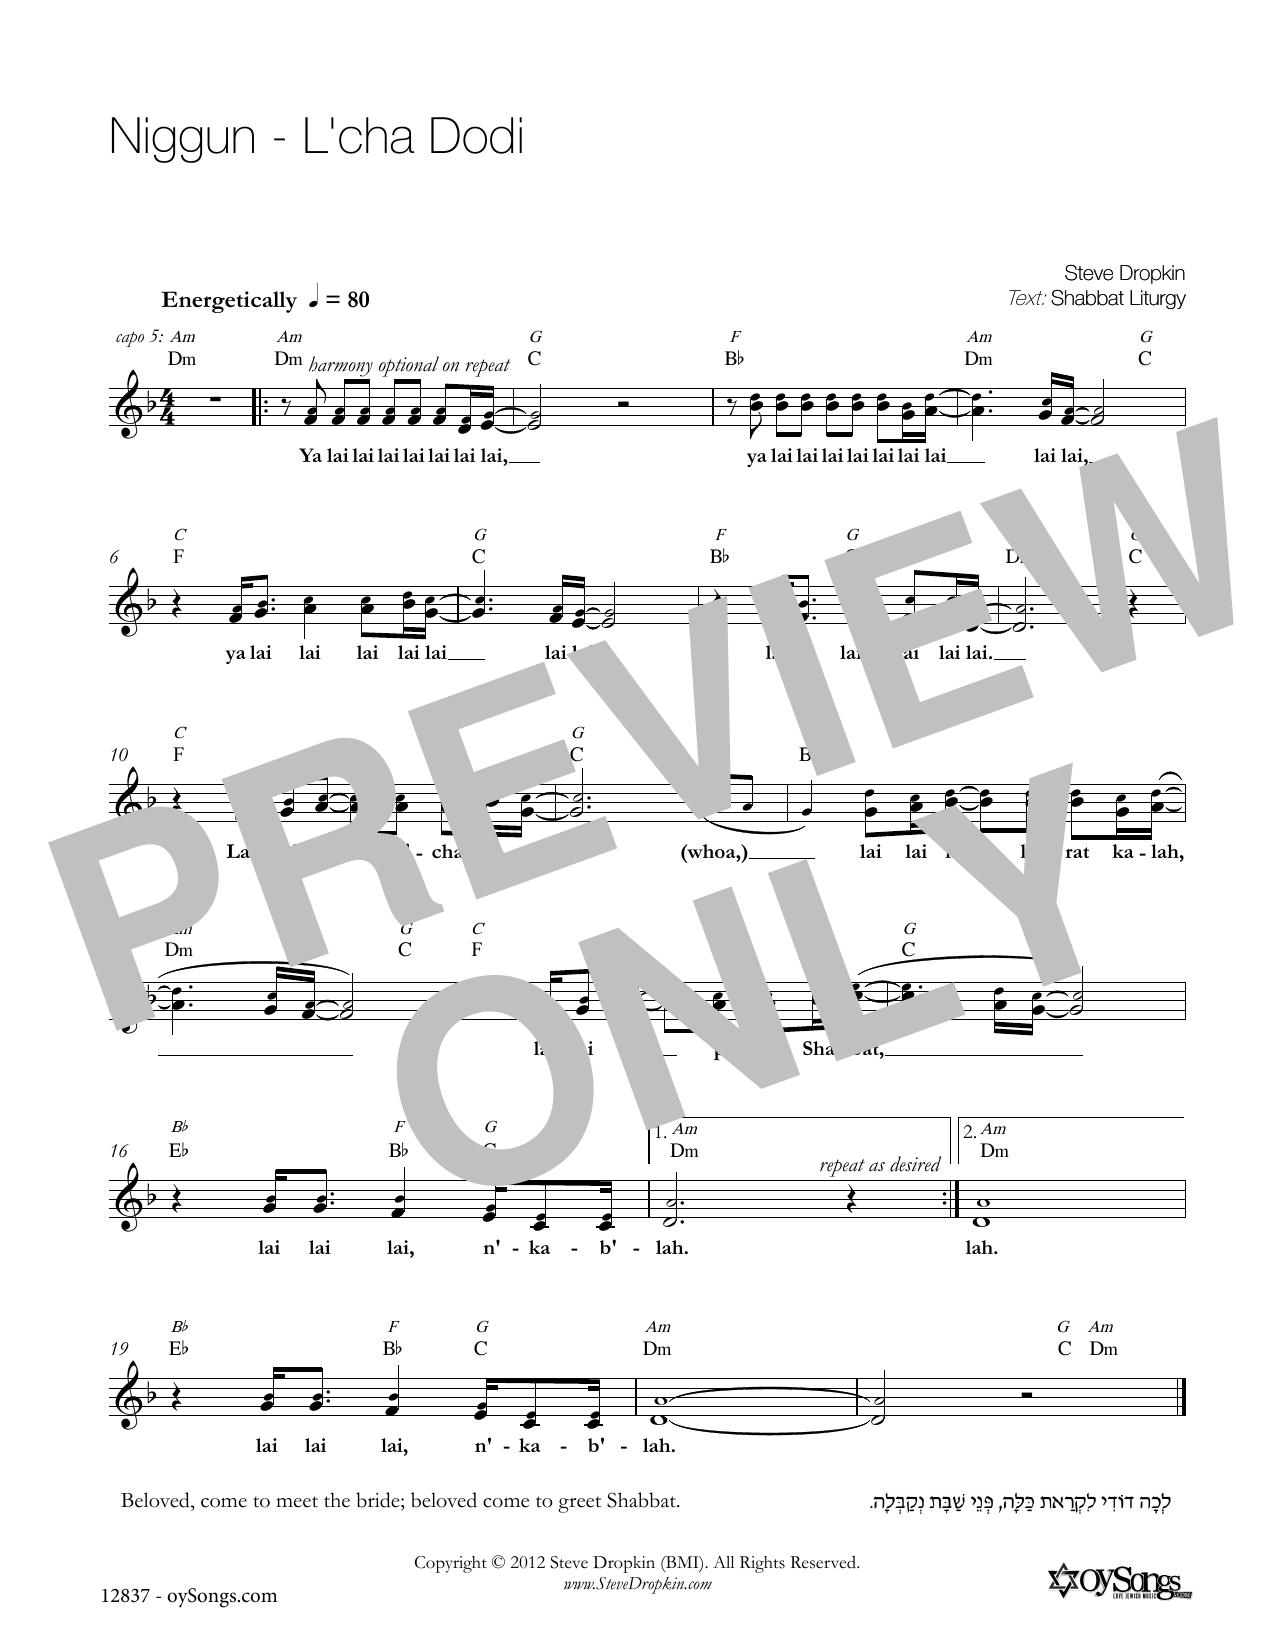 Niggun - L'chah Dodi Sheet Music